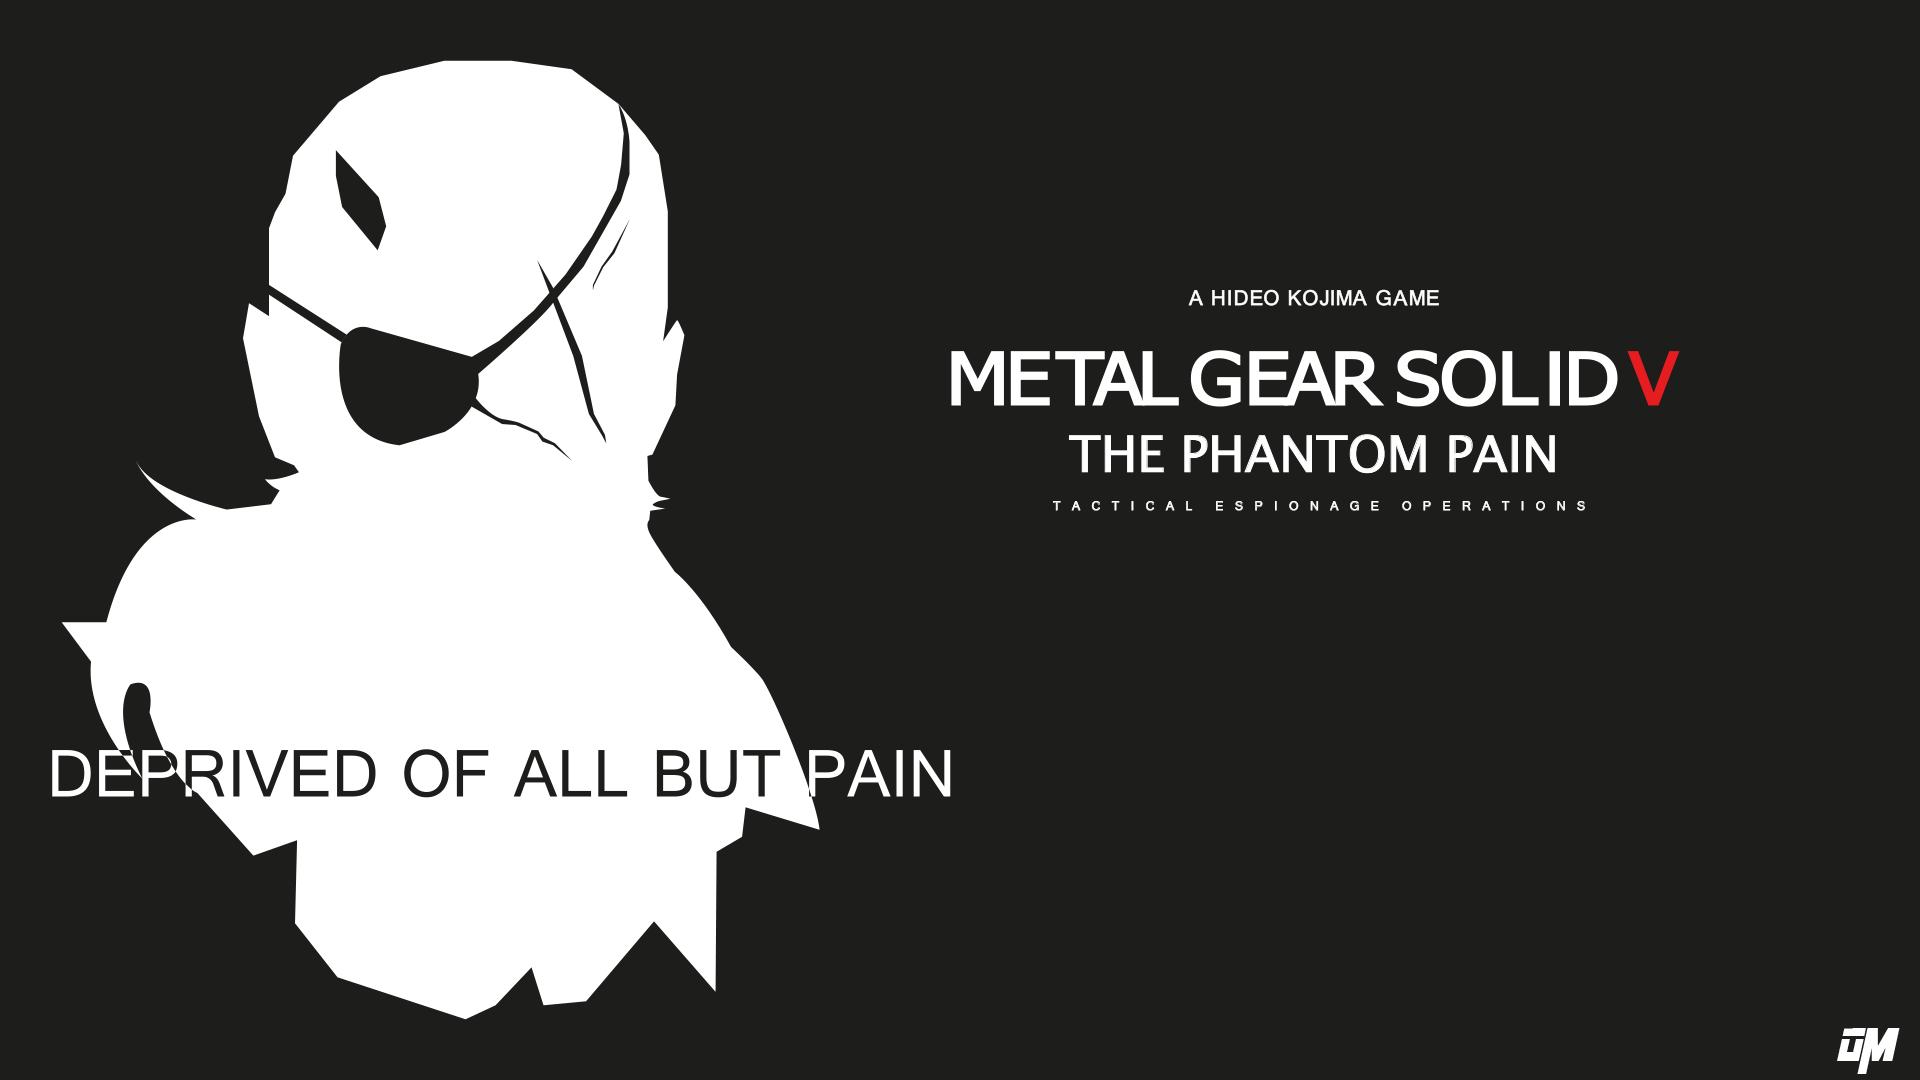 best the art of metal gear solid images on pinterest | desktop